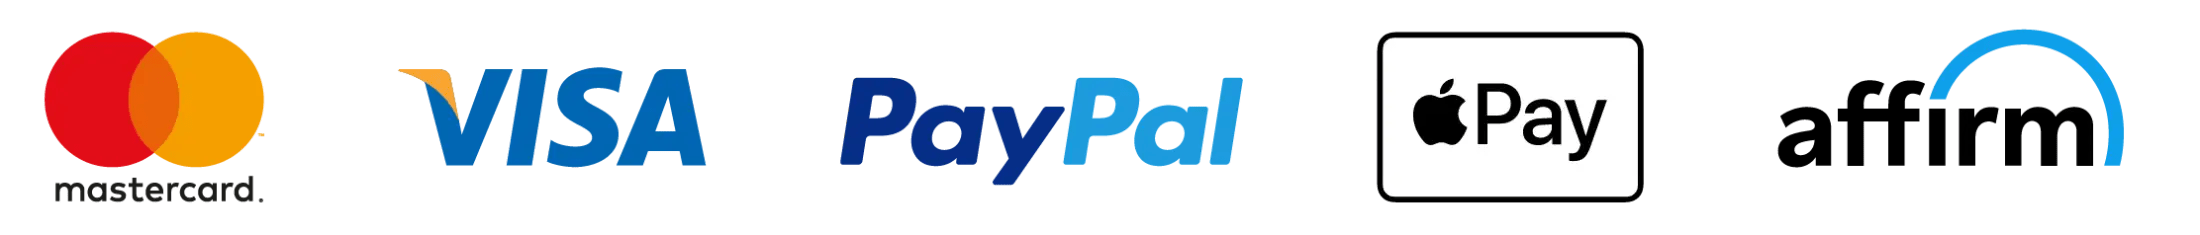 Visa - MasterCard - American Express - PayPal - Apple Pay - Affirm